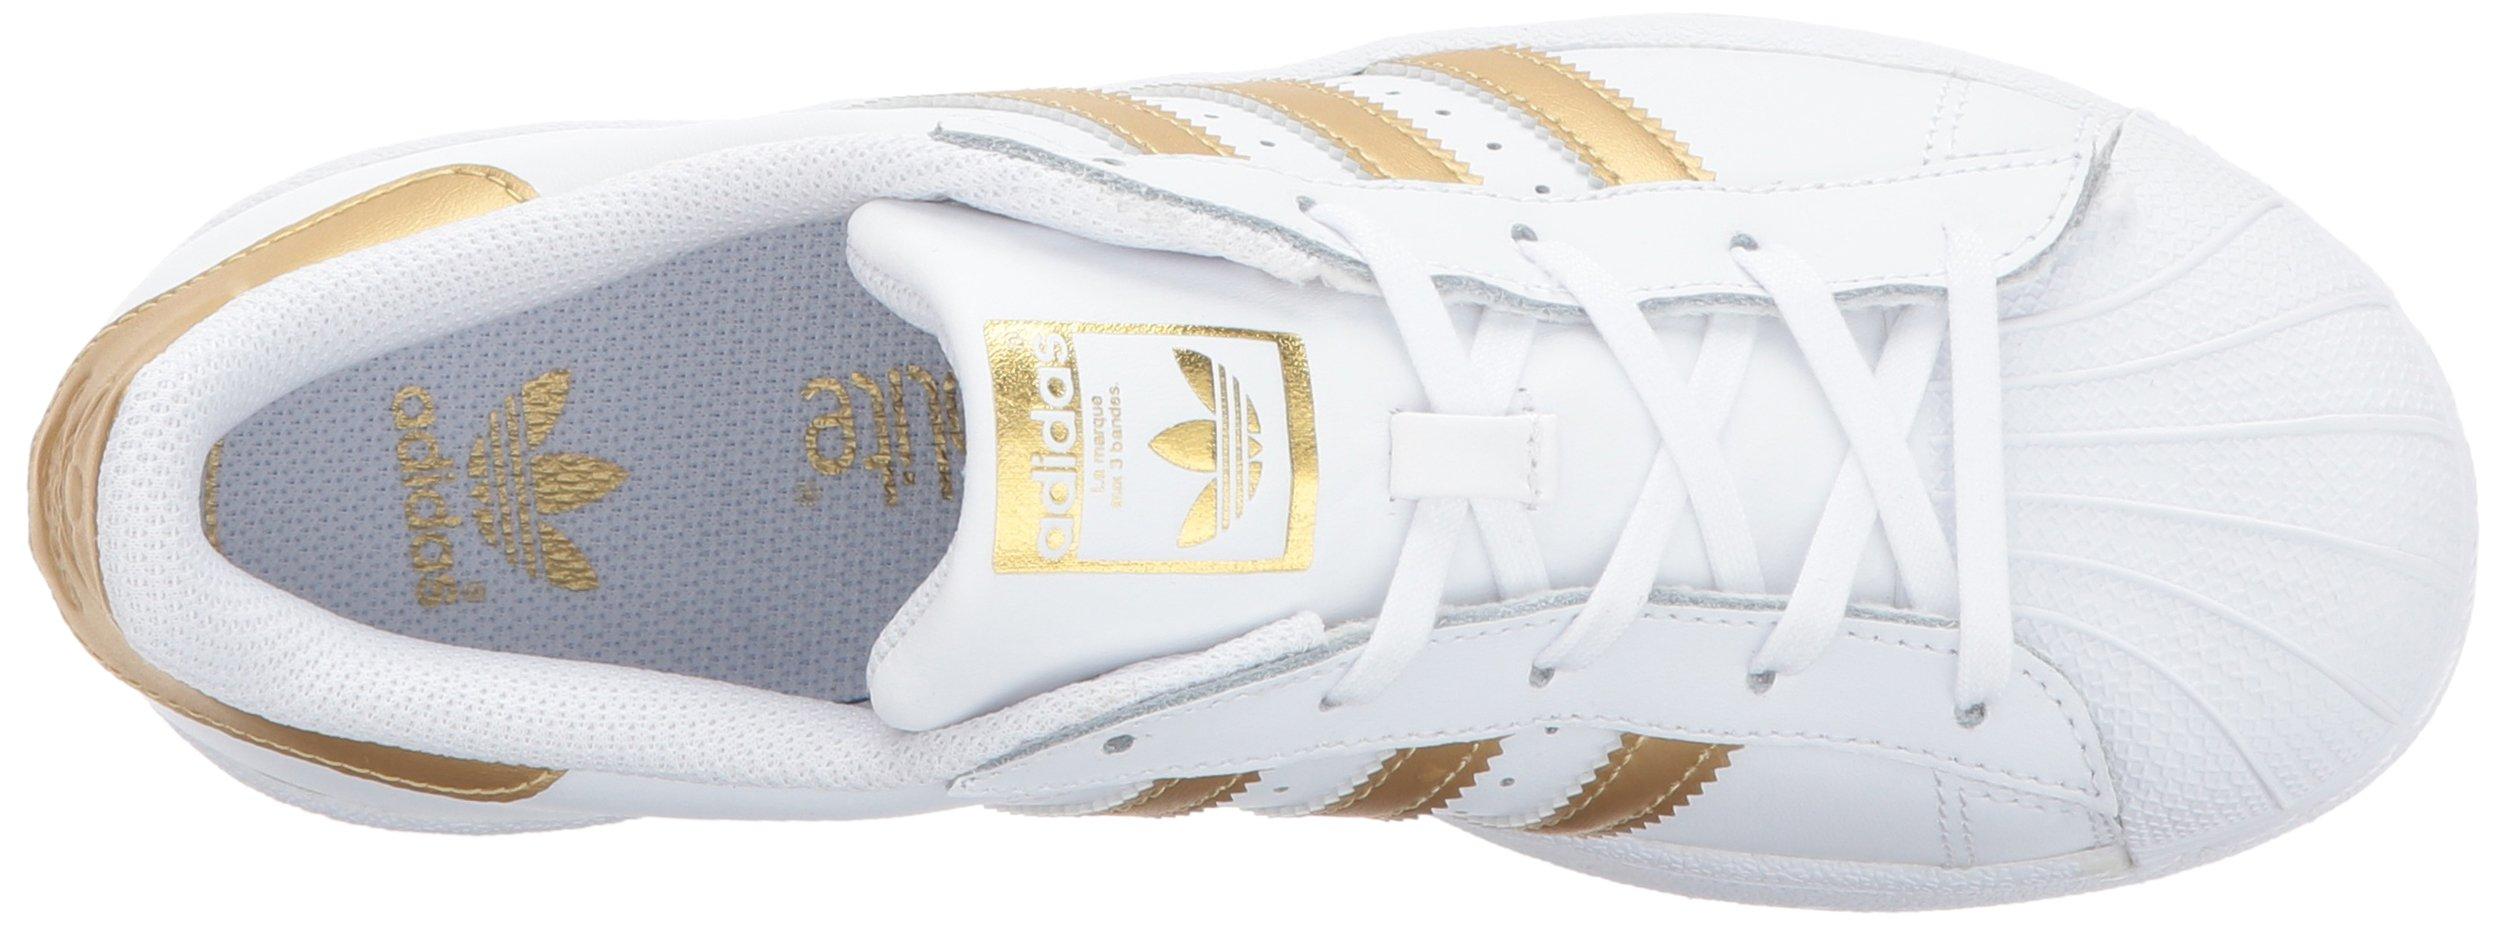 df14c9418b85e adidas Originals Unisex Superstar Running Shoe, White/Gold/Blue, 11K ...